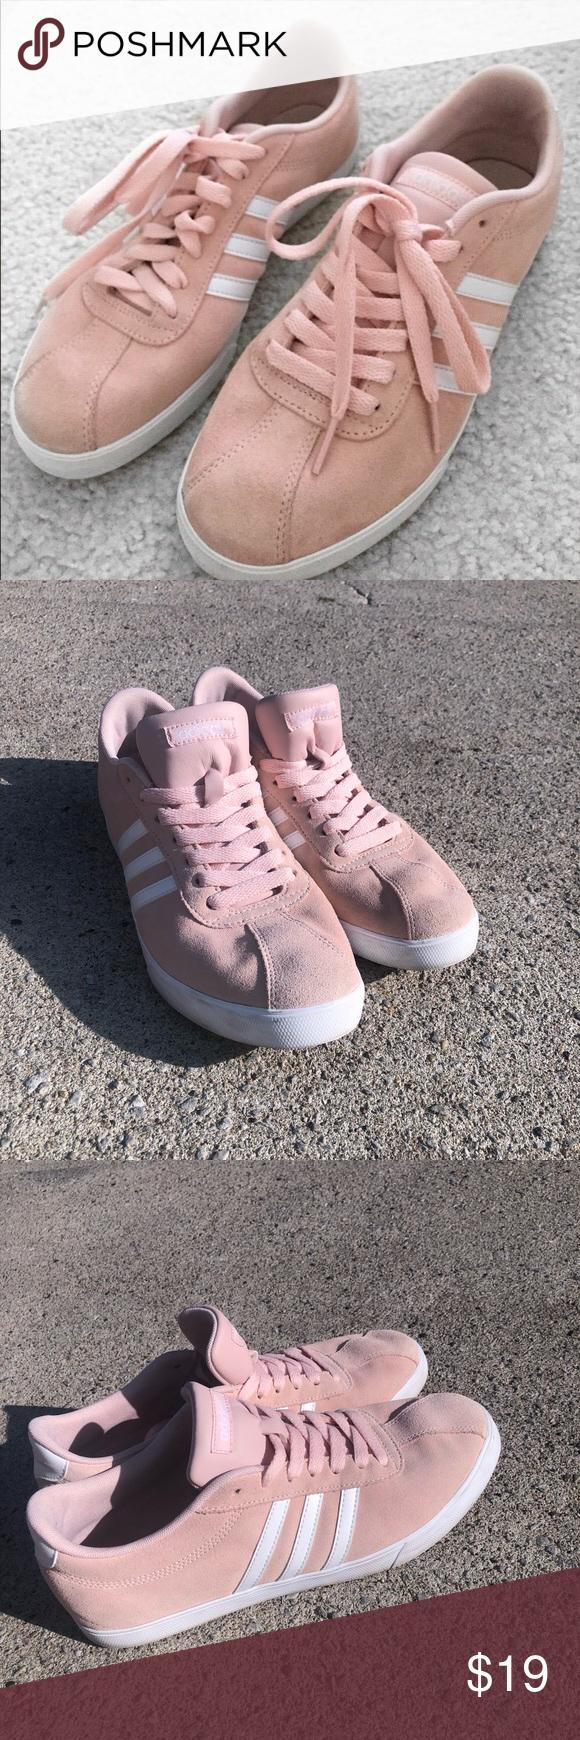 Light Pink Suede Adidas Neo | Pink suede, Pink adidas, Adidas neo